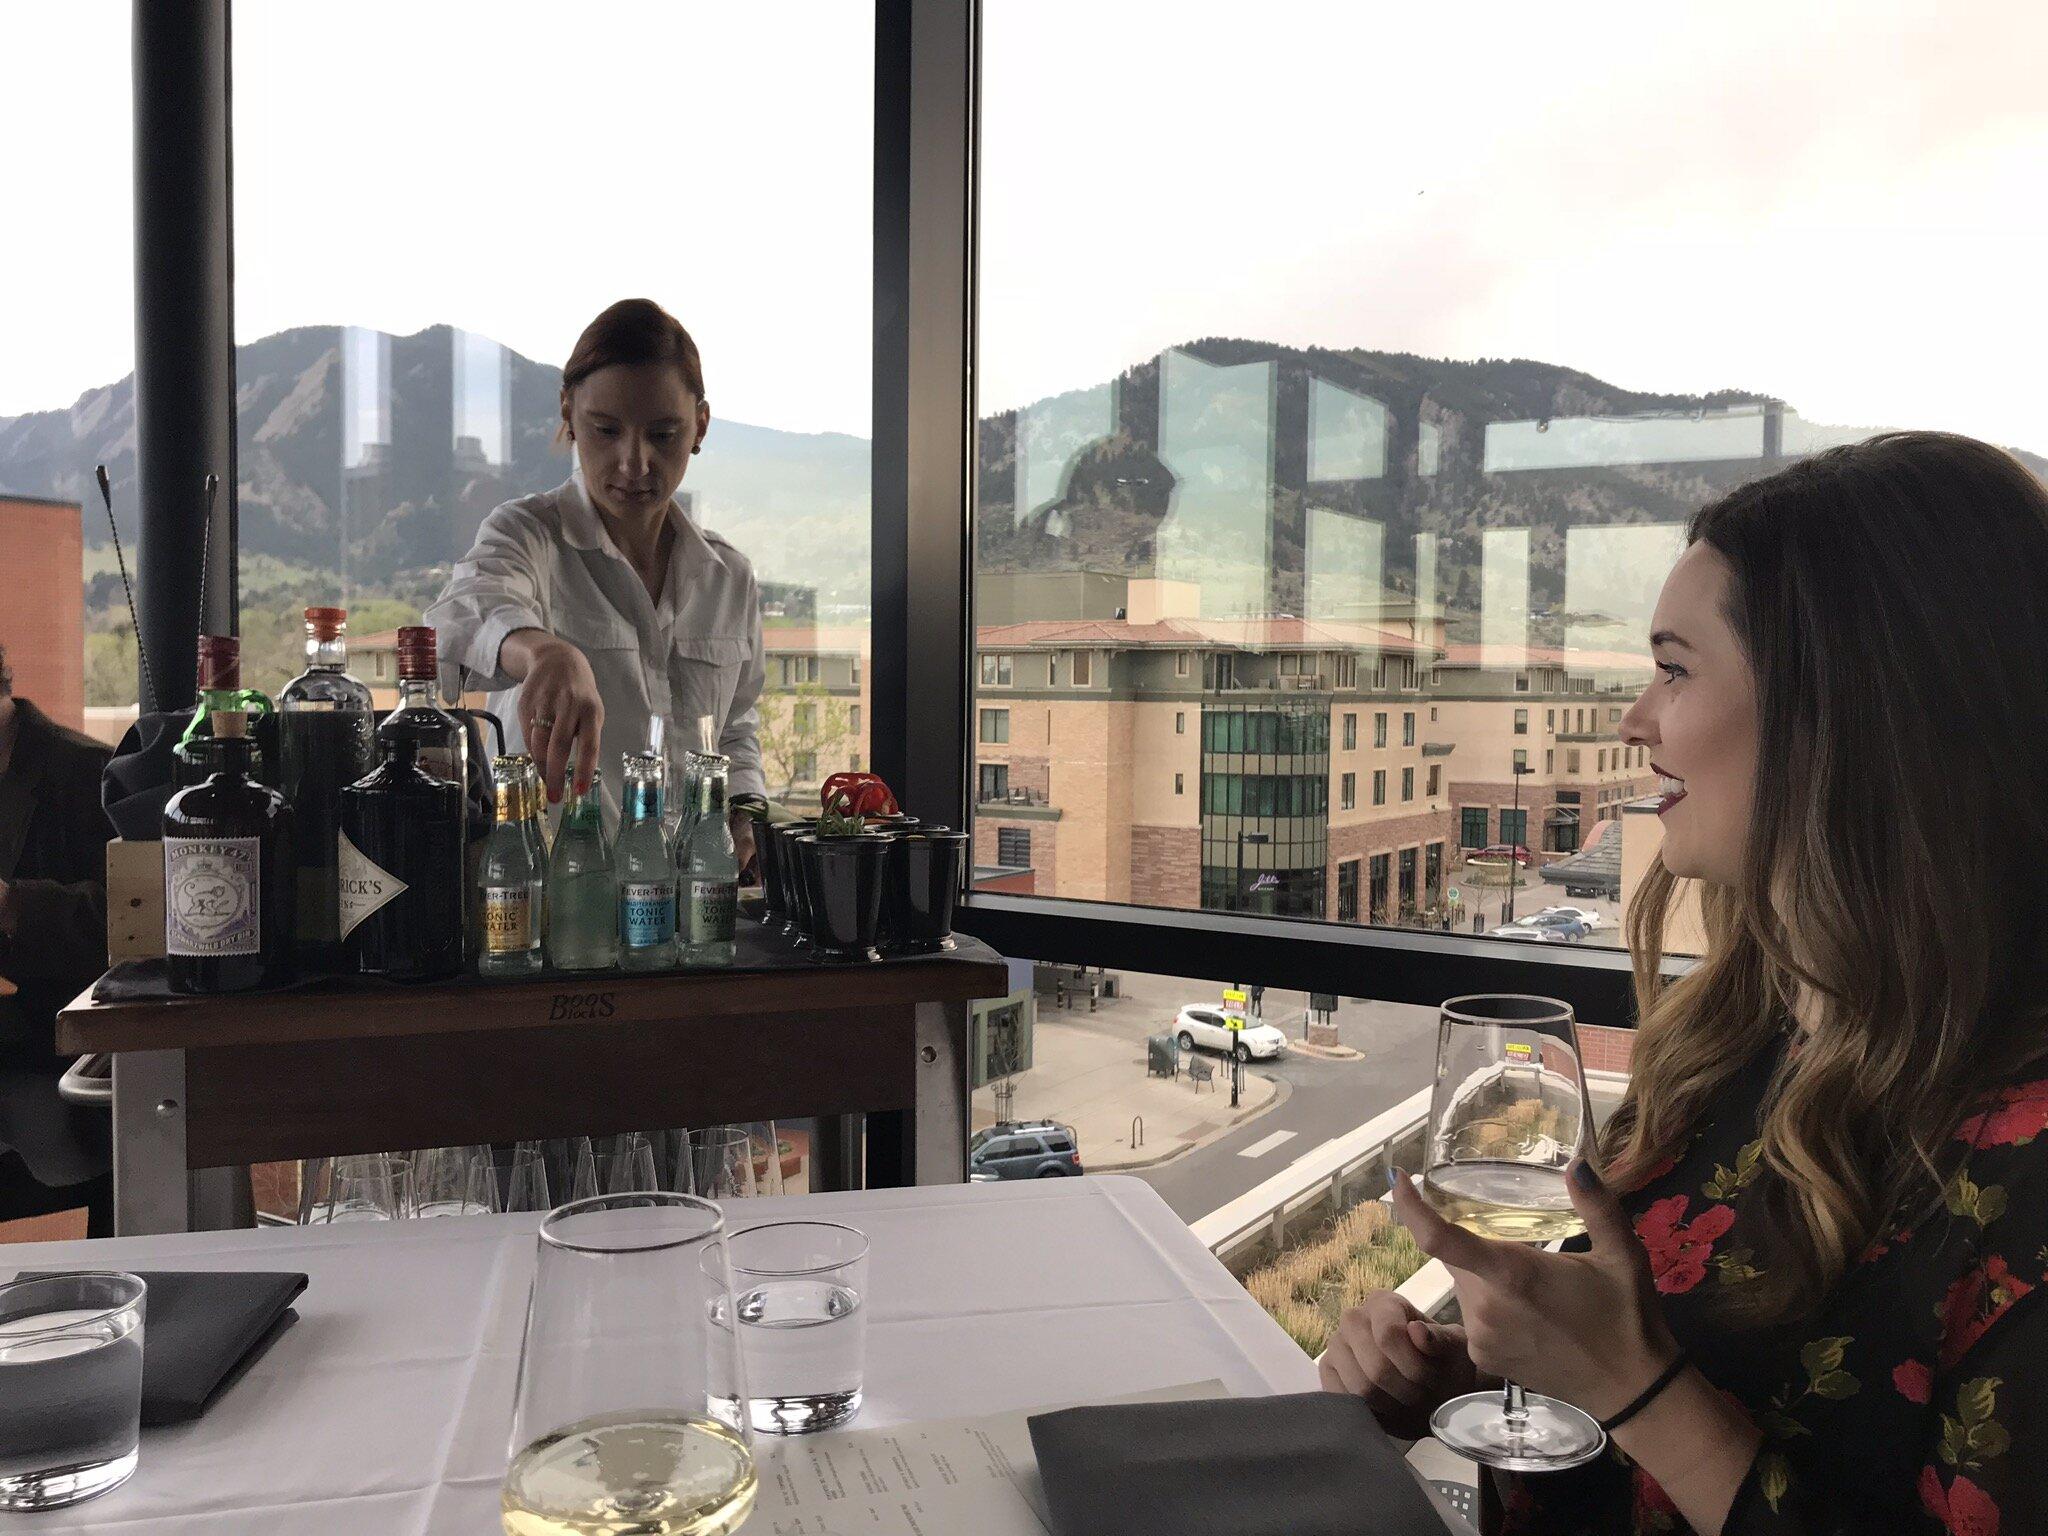 Table-side Gin and Tonics at Corrida